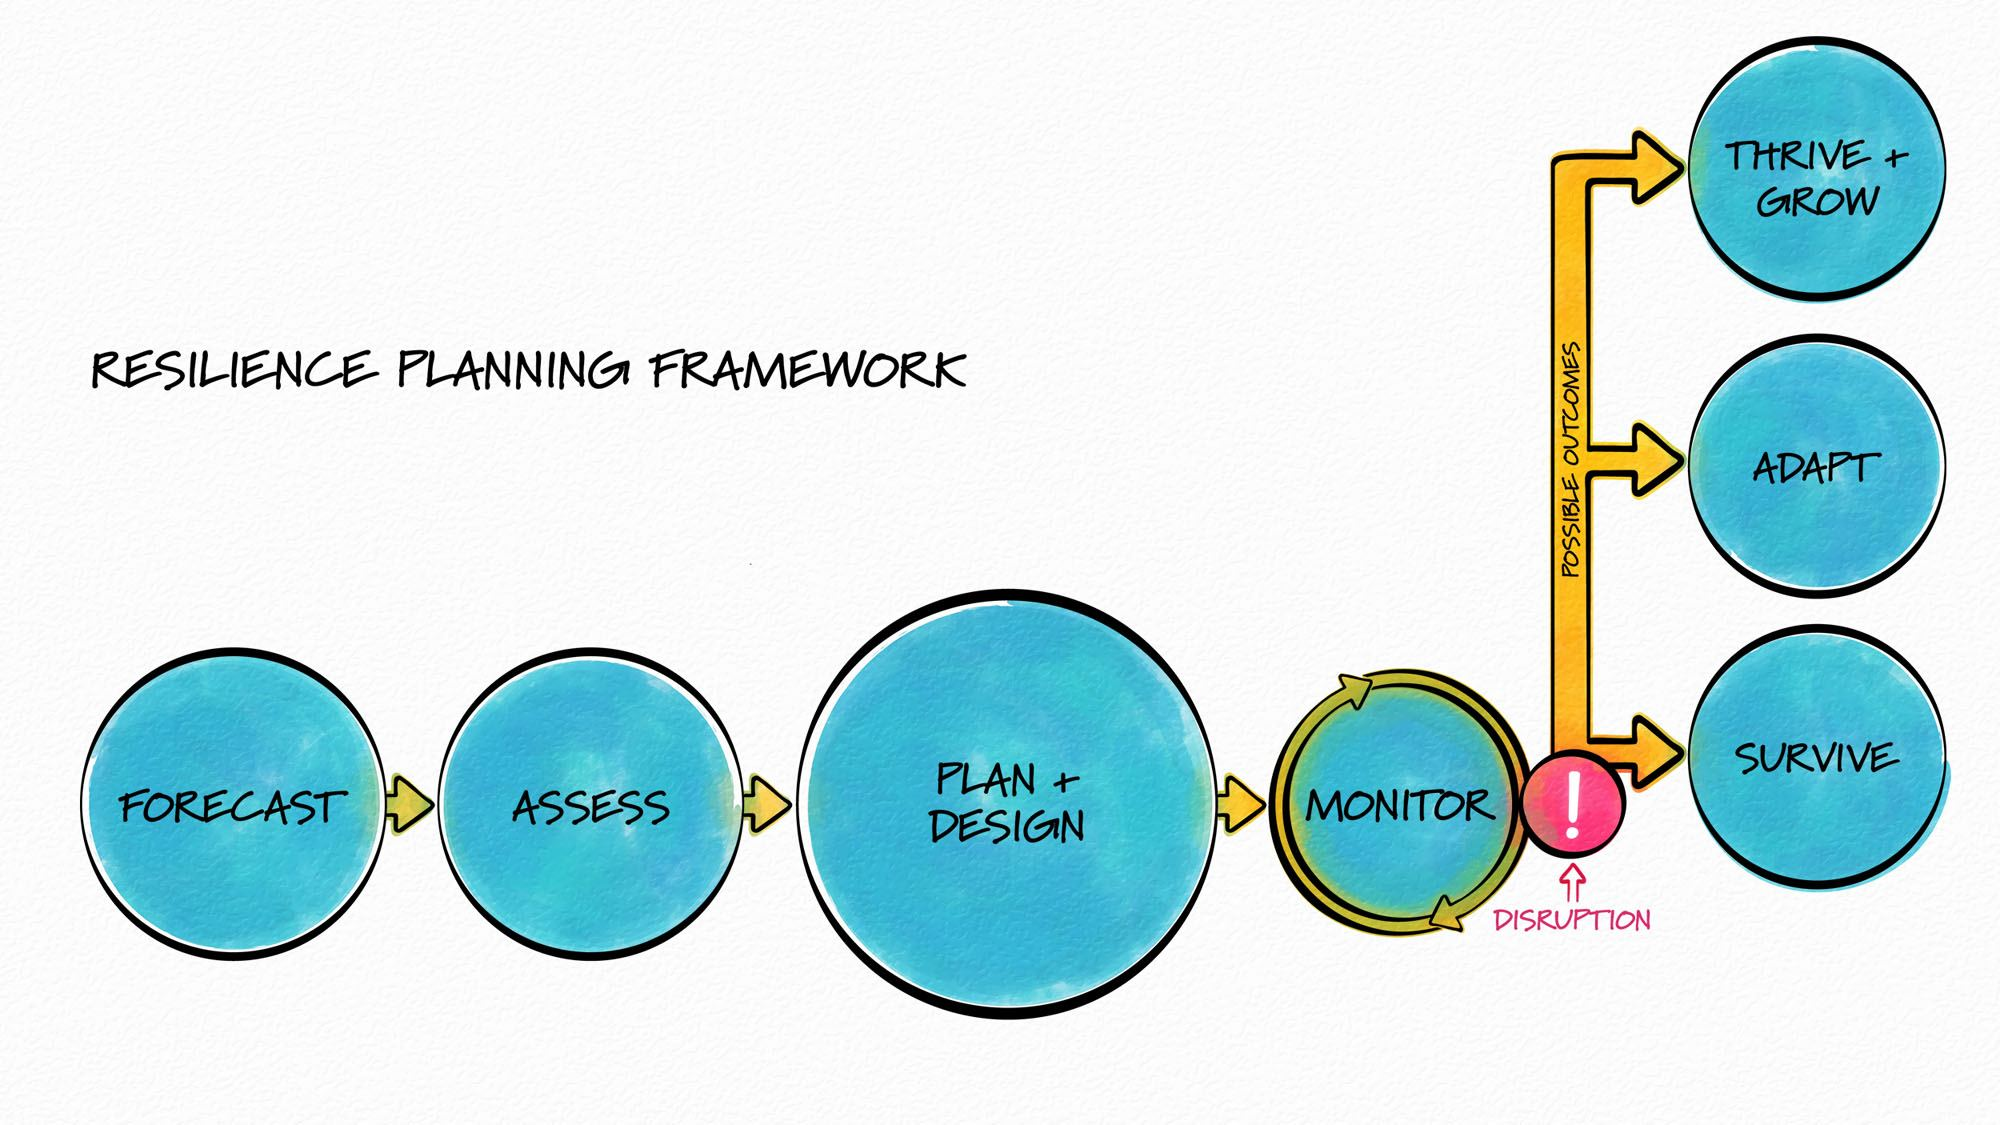 Resilience Planning Framework